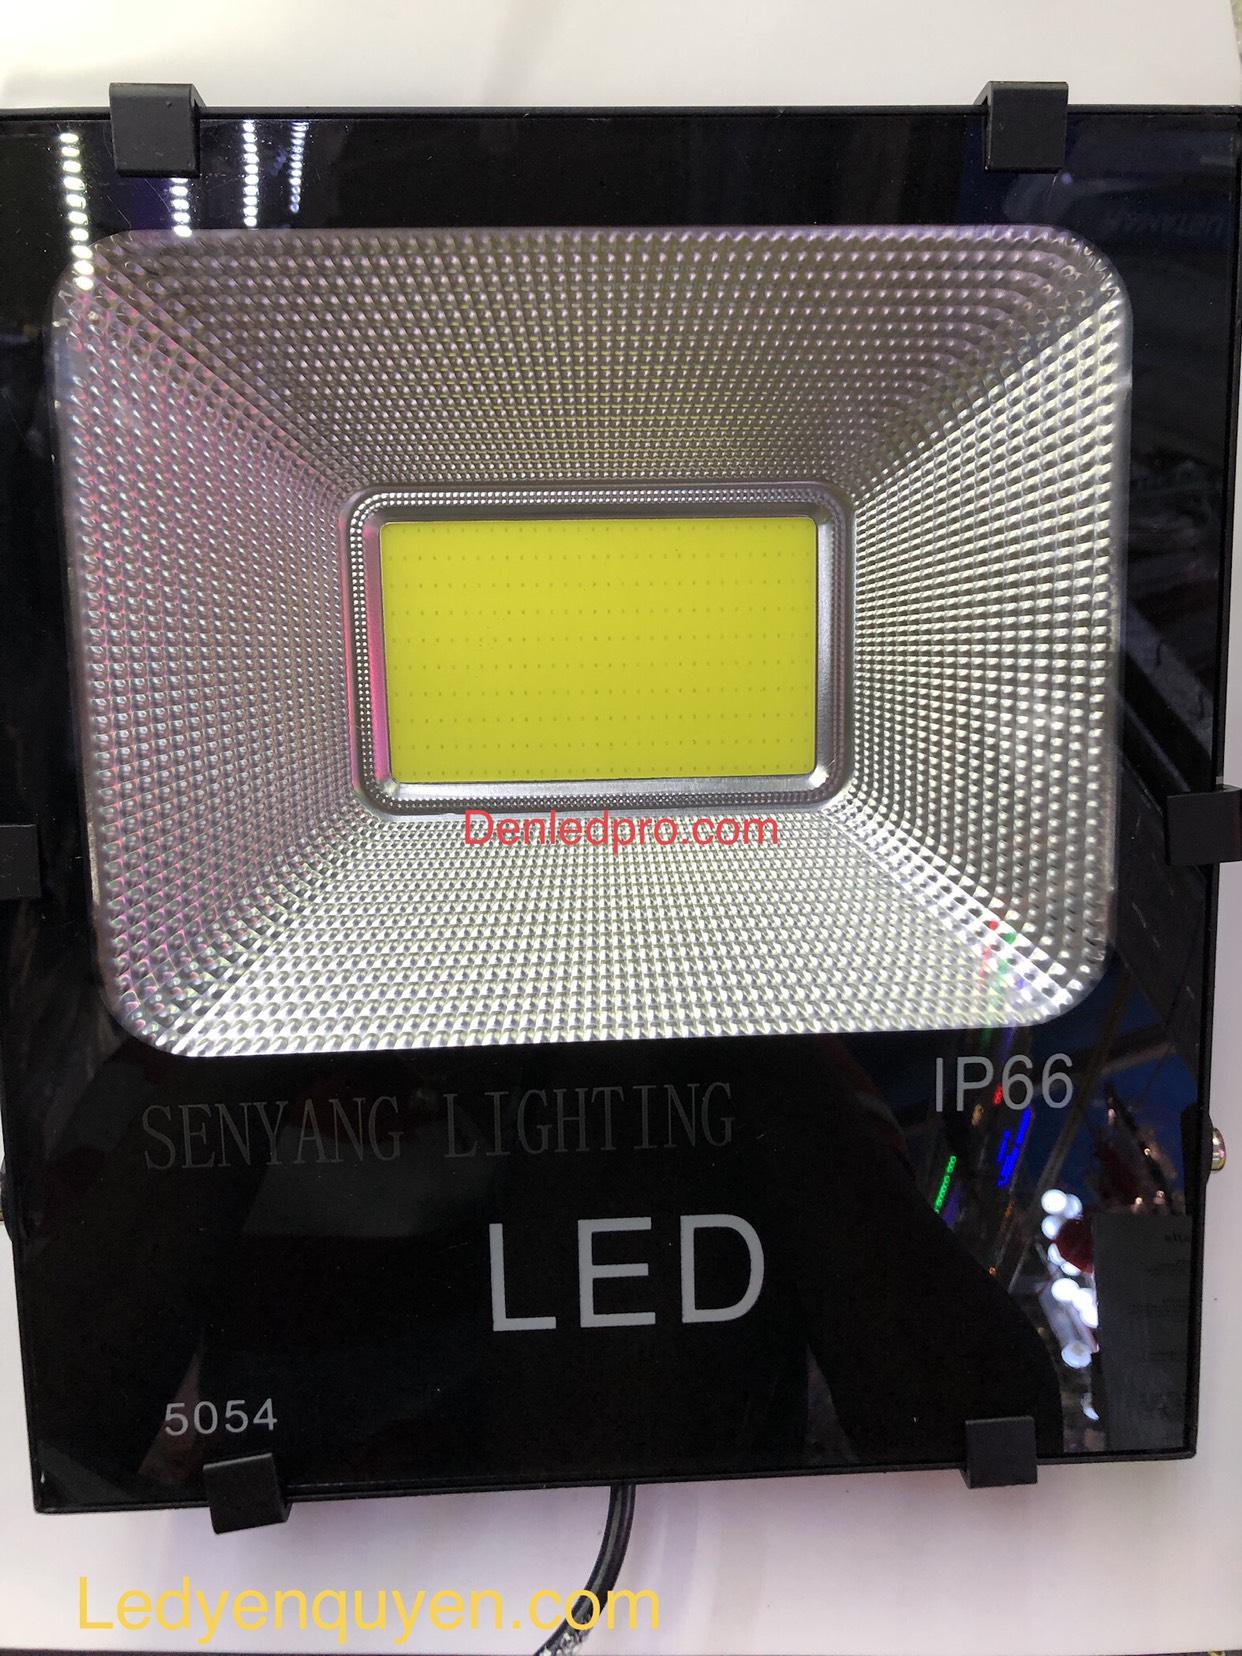 Đèn Pha LED 150W Senyang Light